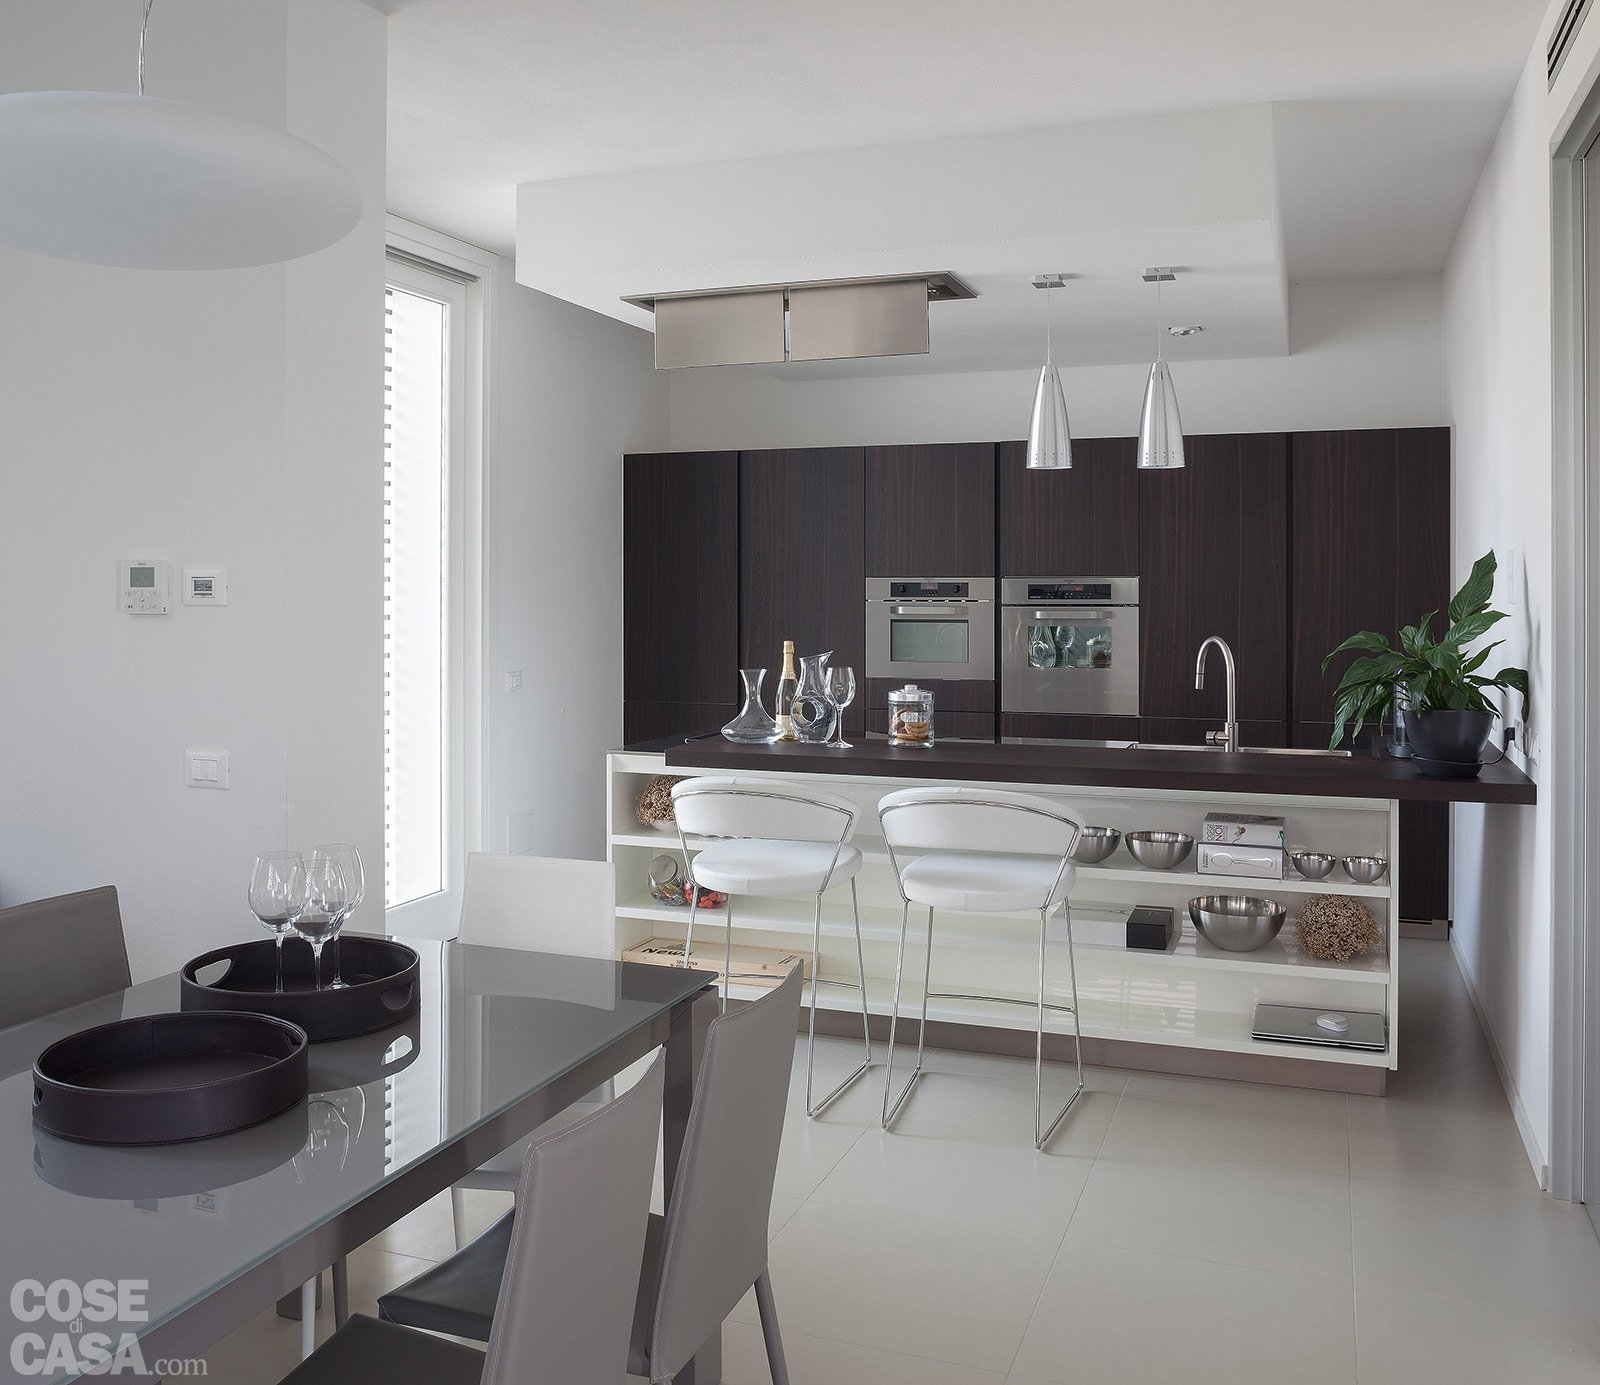 Ikea Illuminazione Cucina Gallery - Ameripest.us - ameripest.us